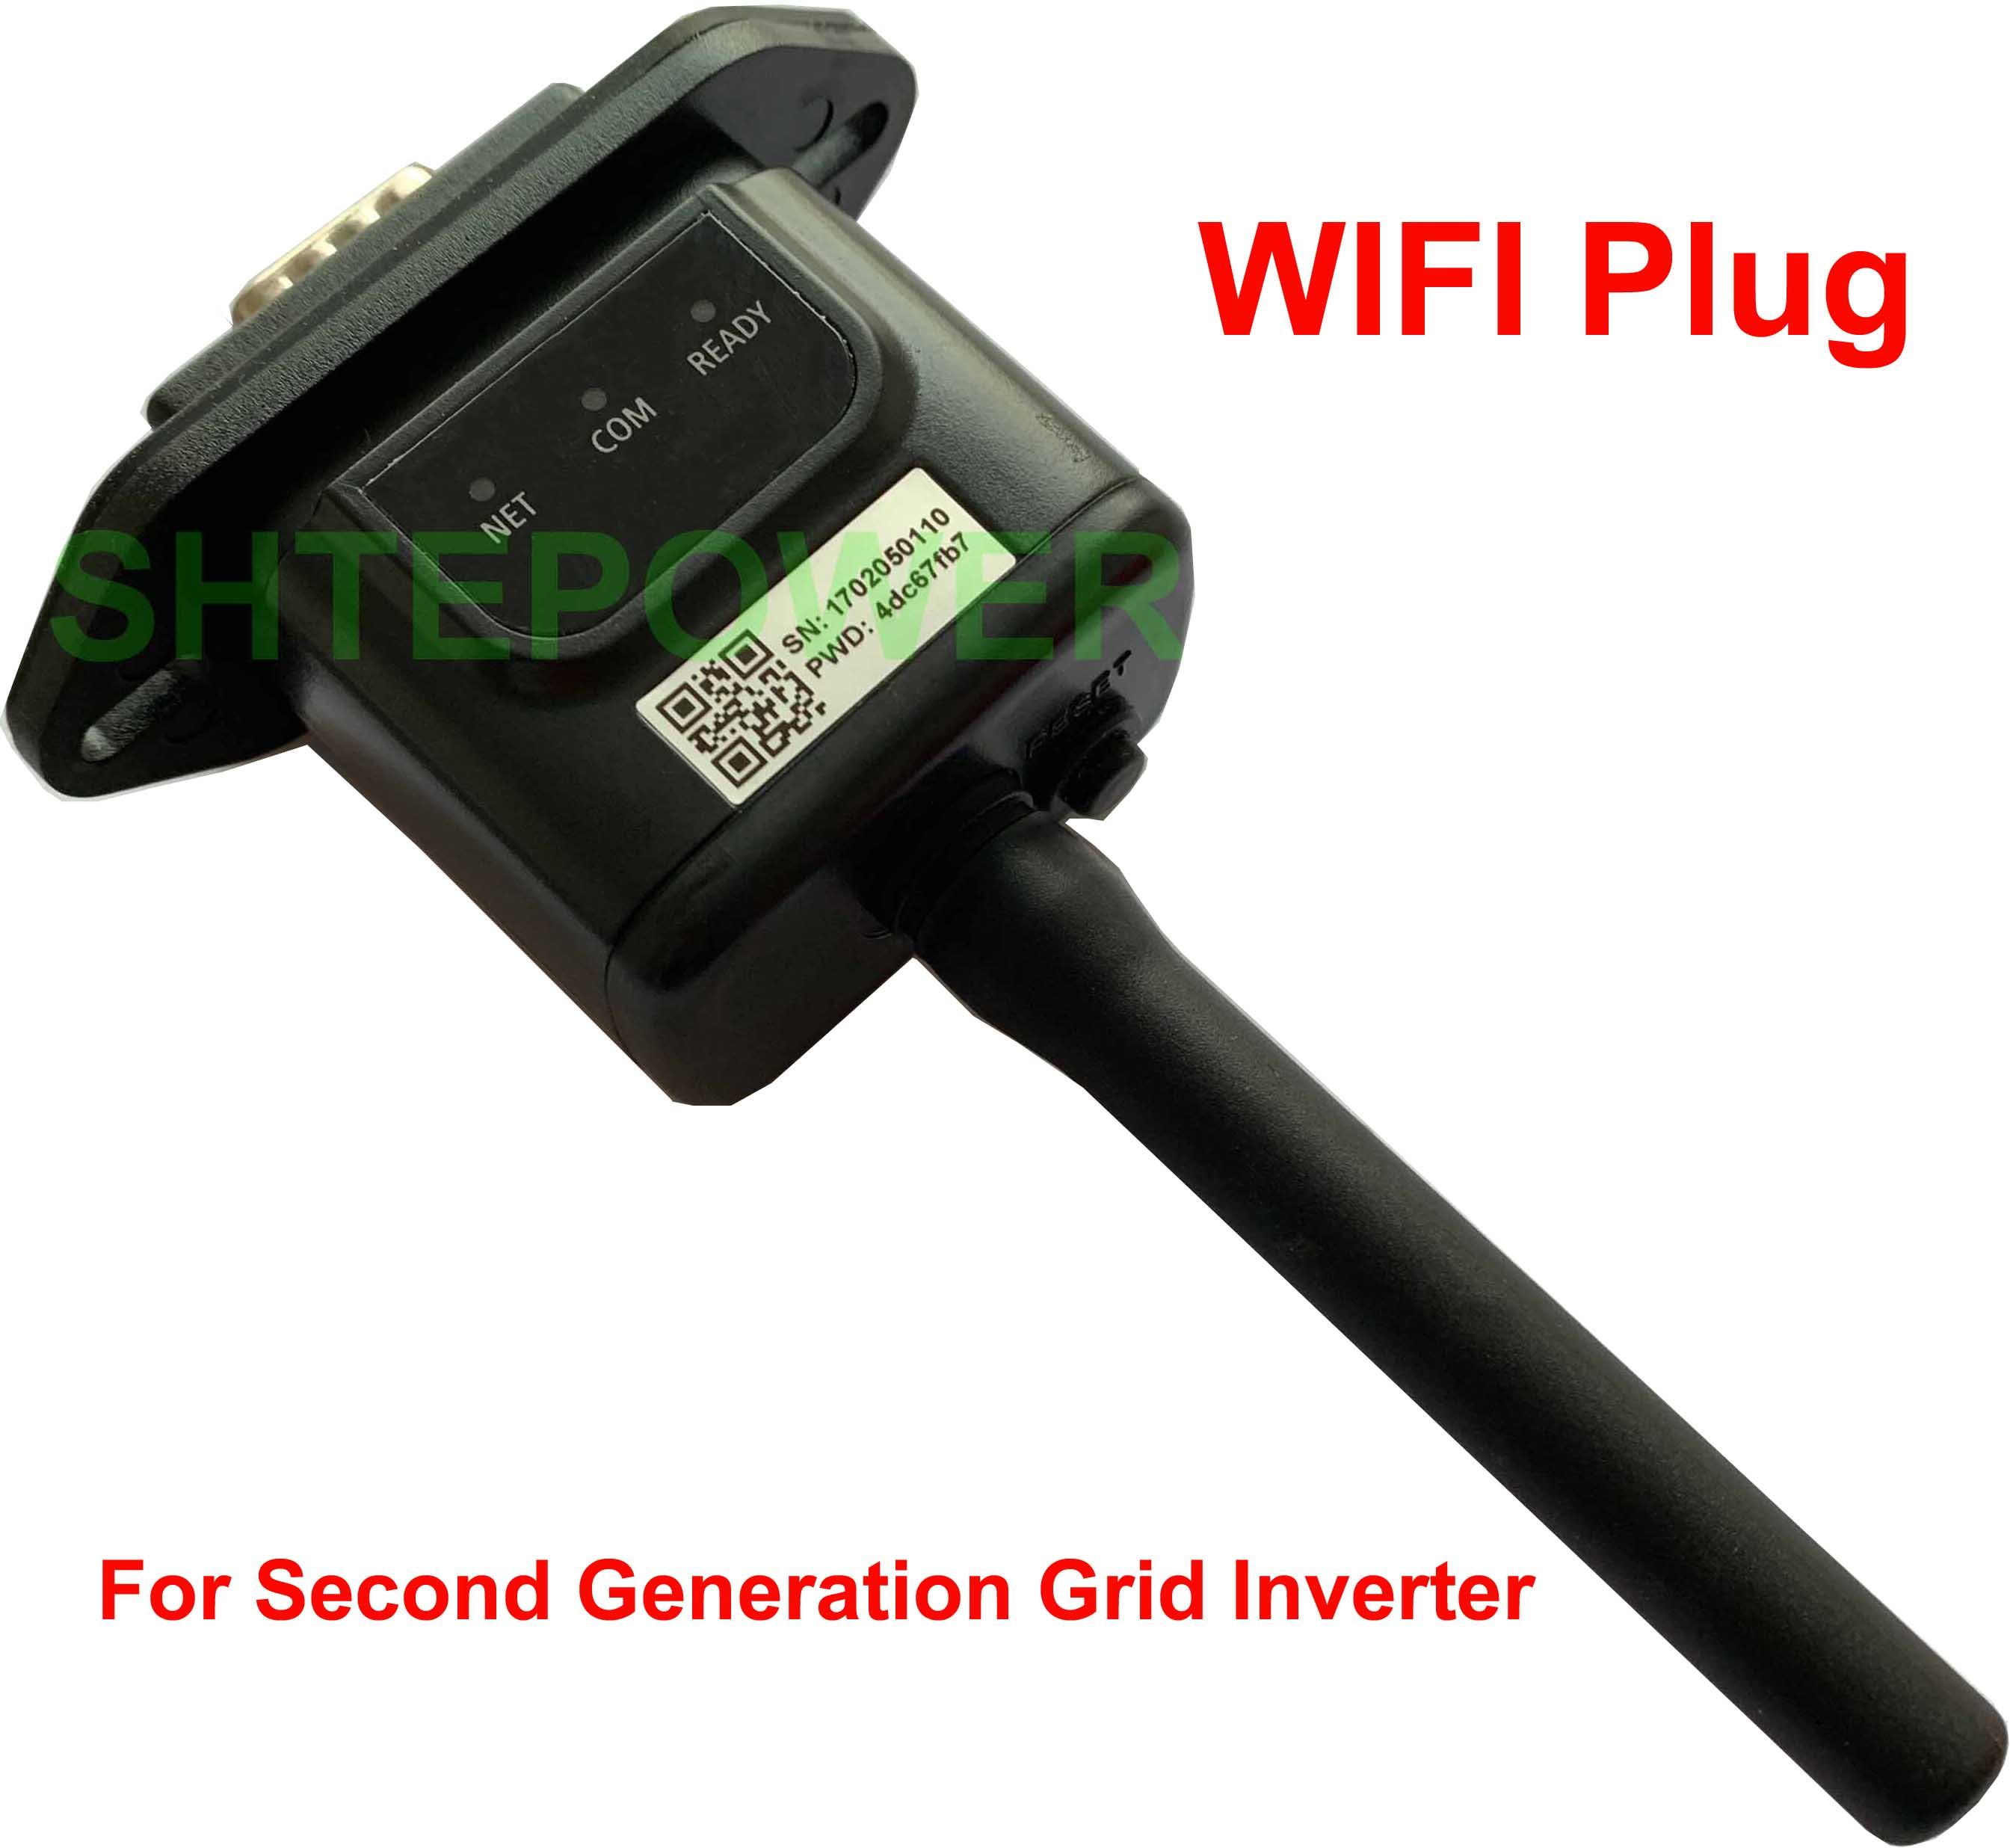 Wifi Port Plug Limiter sensor for MPPT 1000W2000W NEW SUN Solar Grid Tie Inverter RS485 connected Web/Phone App online Monitor